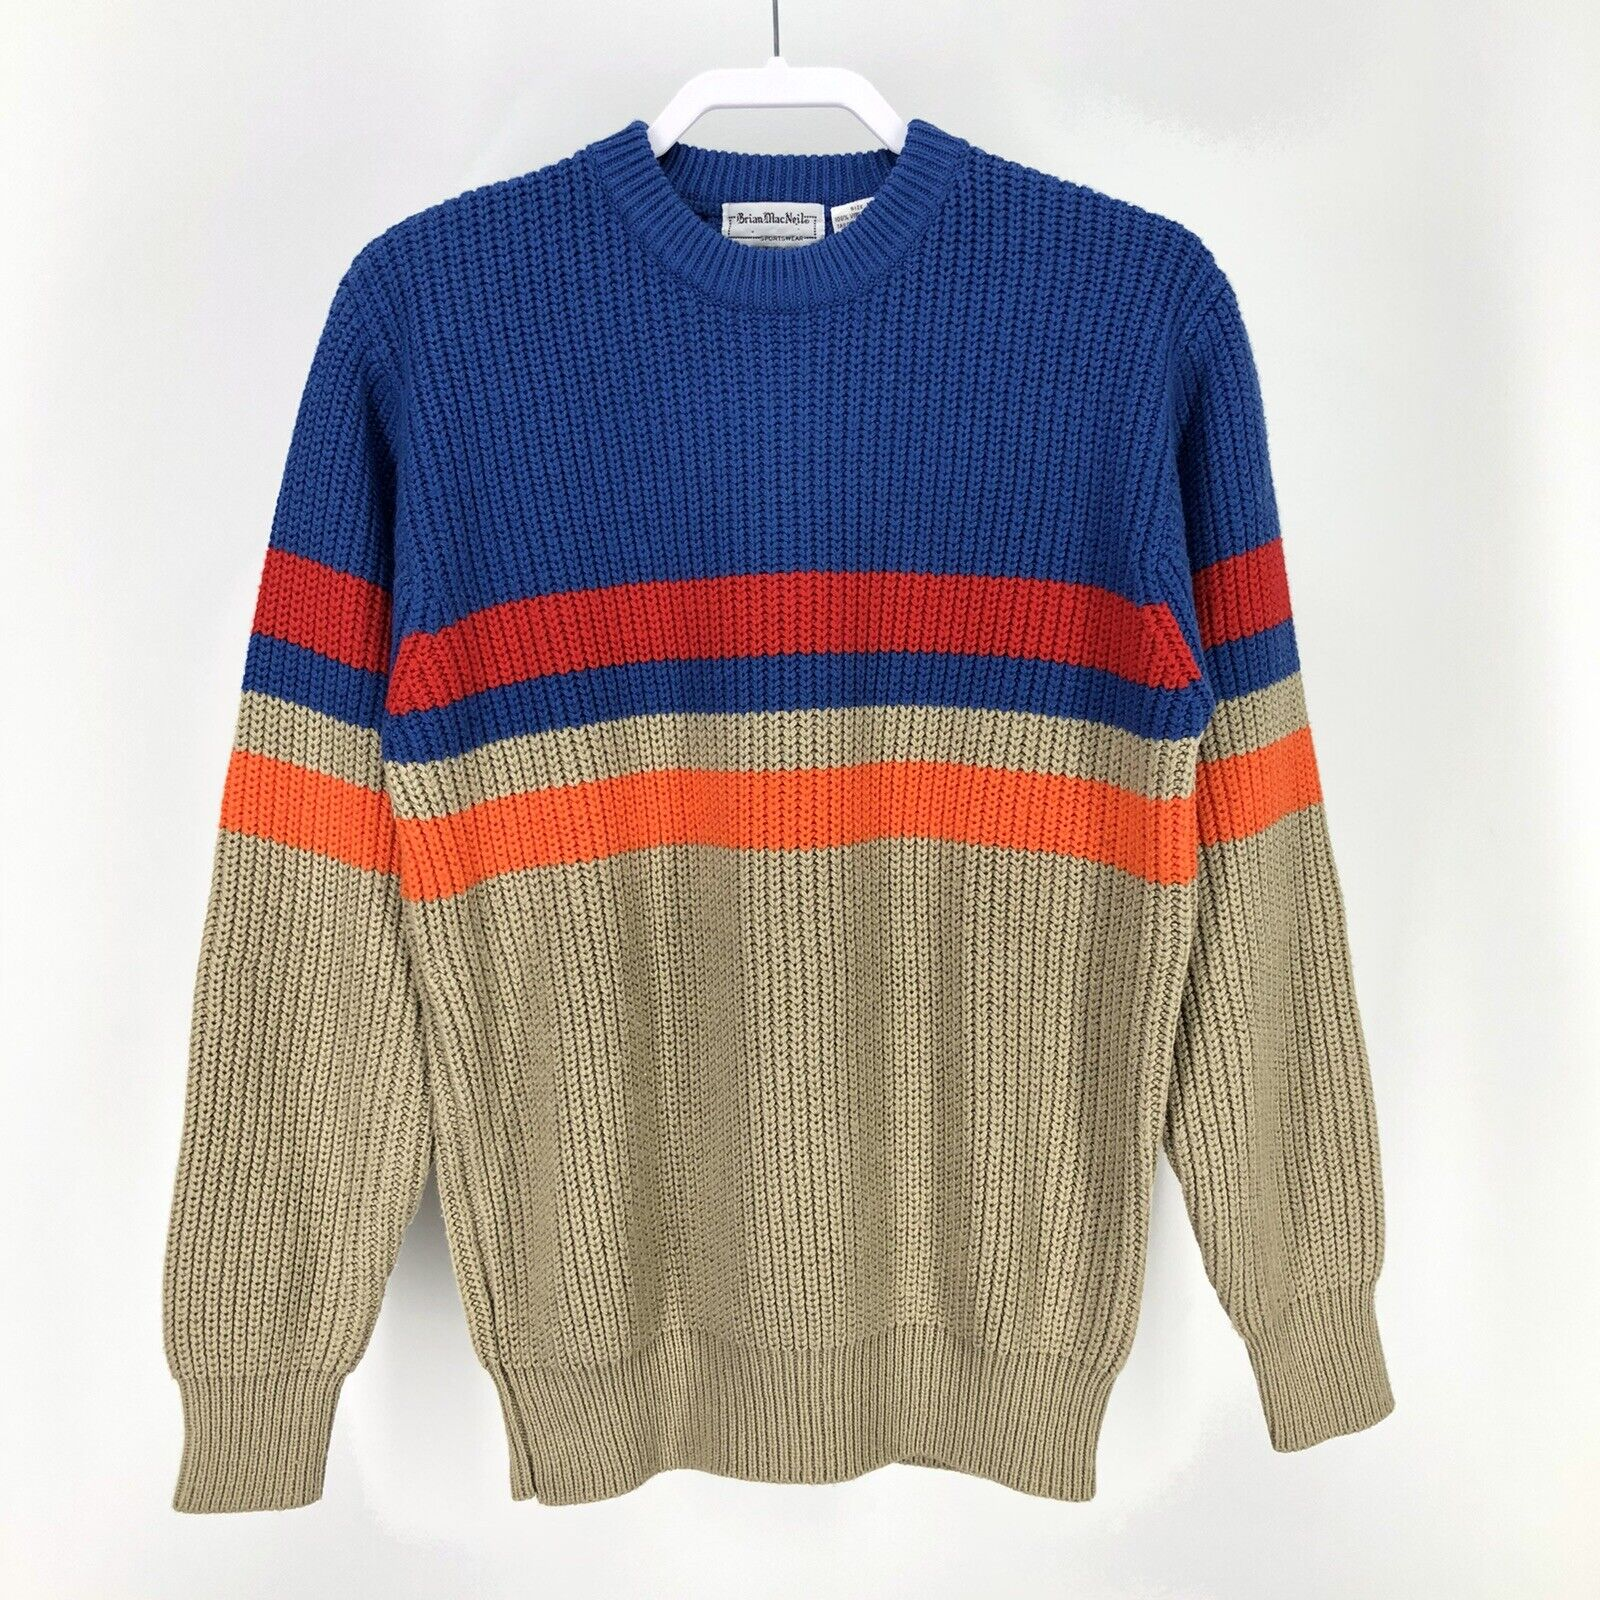 70s Crew Neck Sweater Burgandy and Gray Acrylic Pullover Retro Unisex Ski Sweater Size XL Vintage Men/'s Sweater